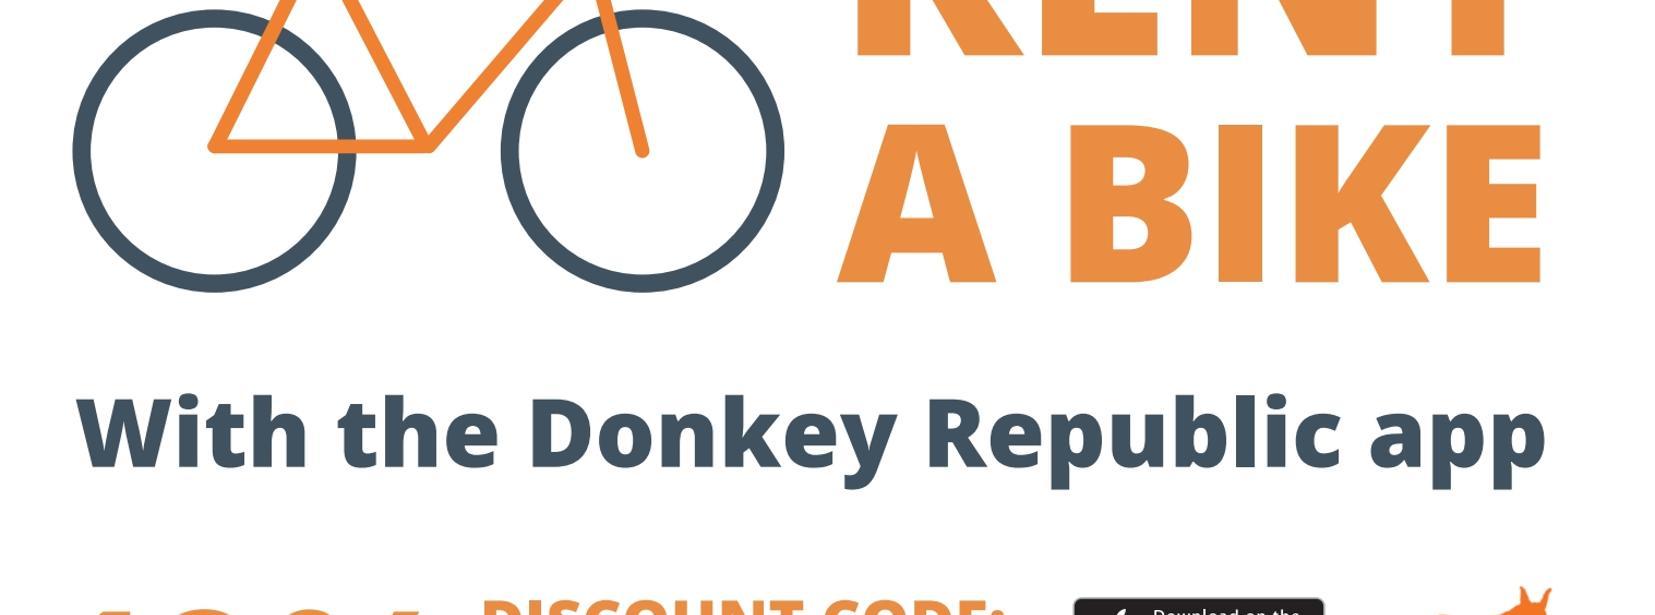 10% discount on Donkey Republic bike rental